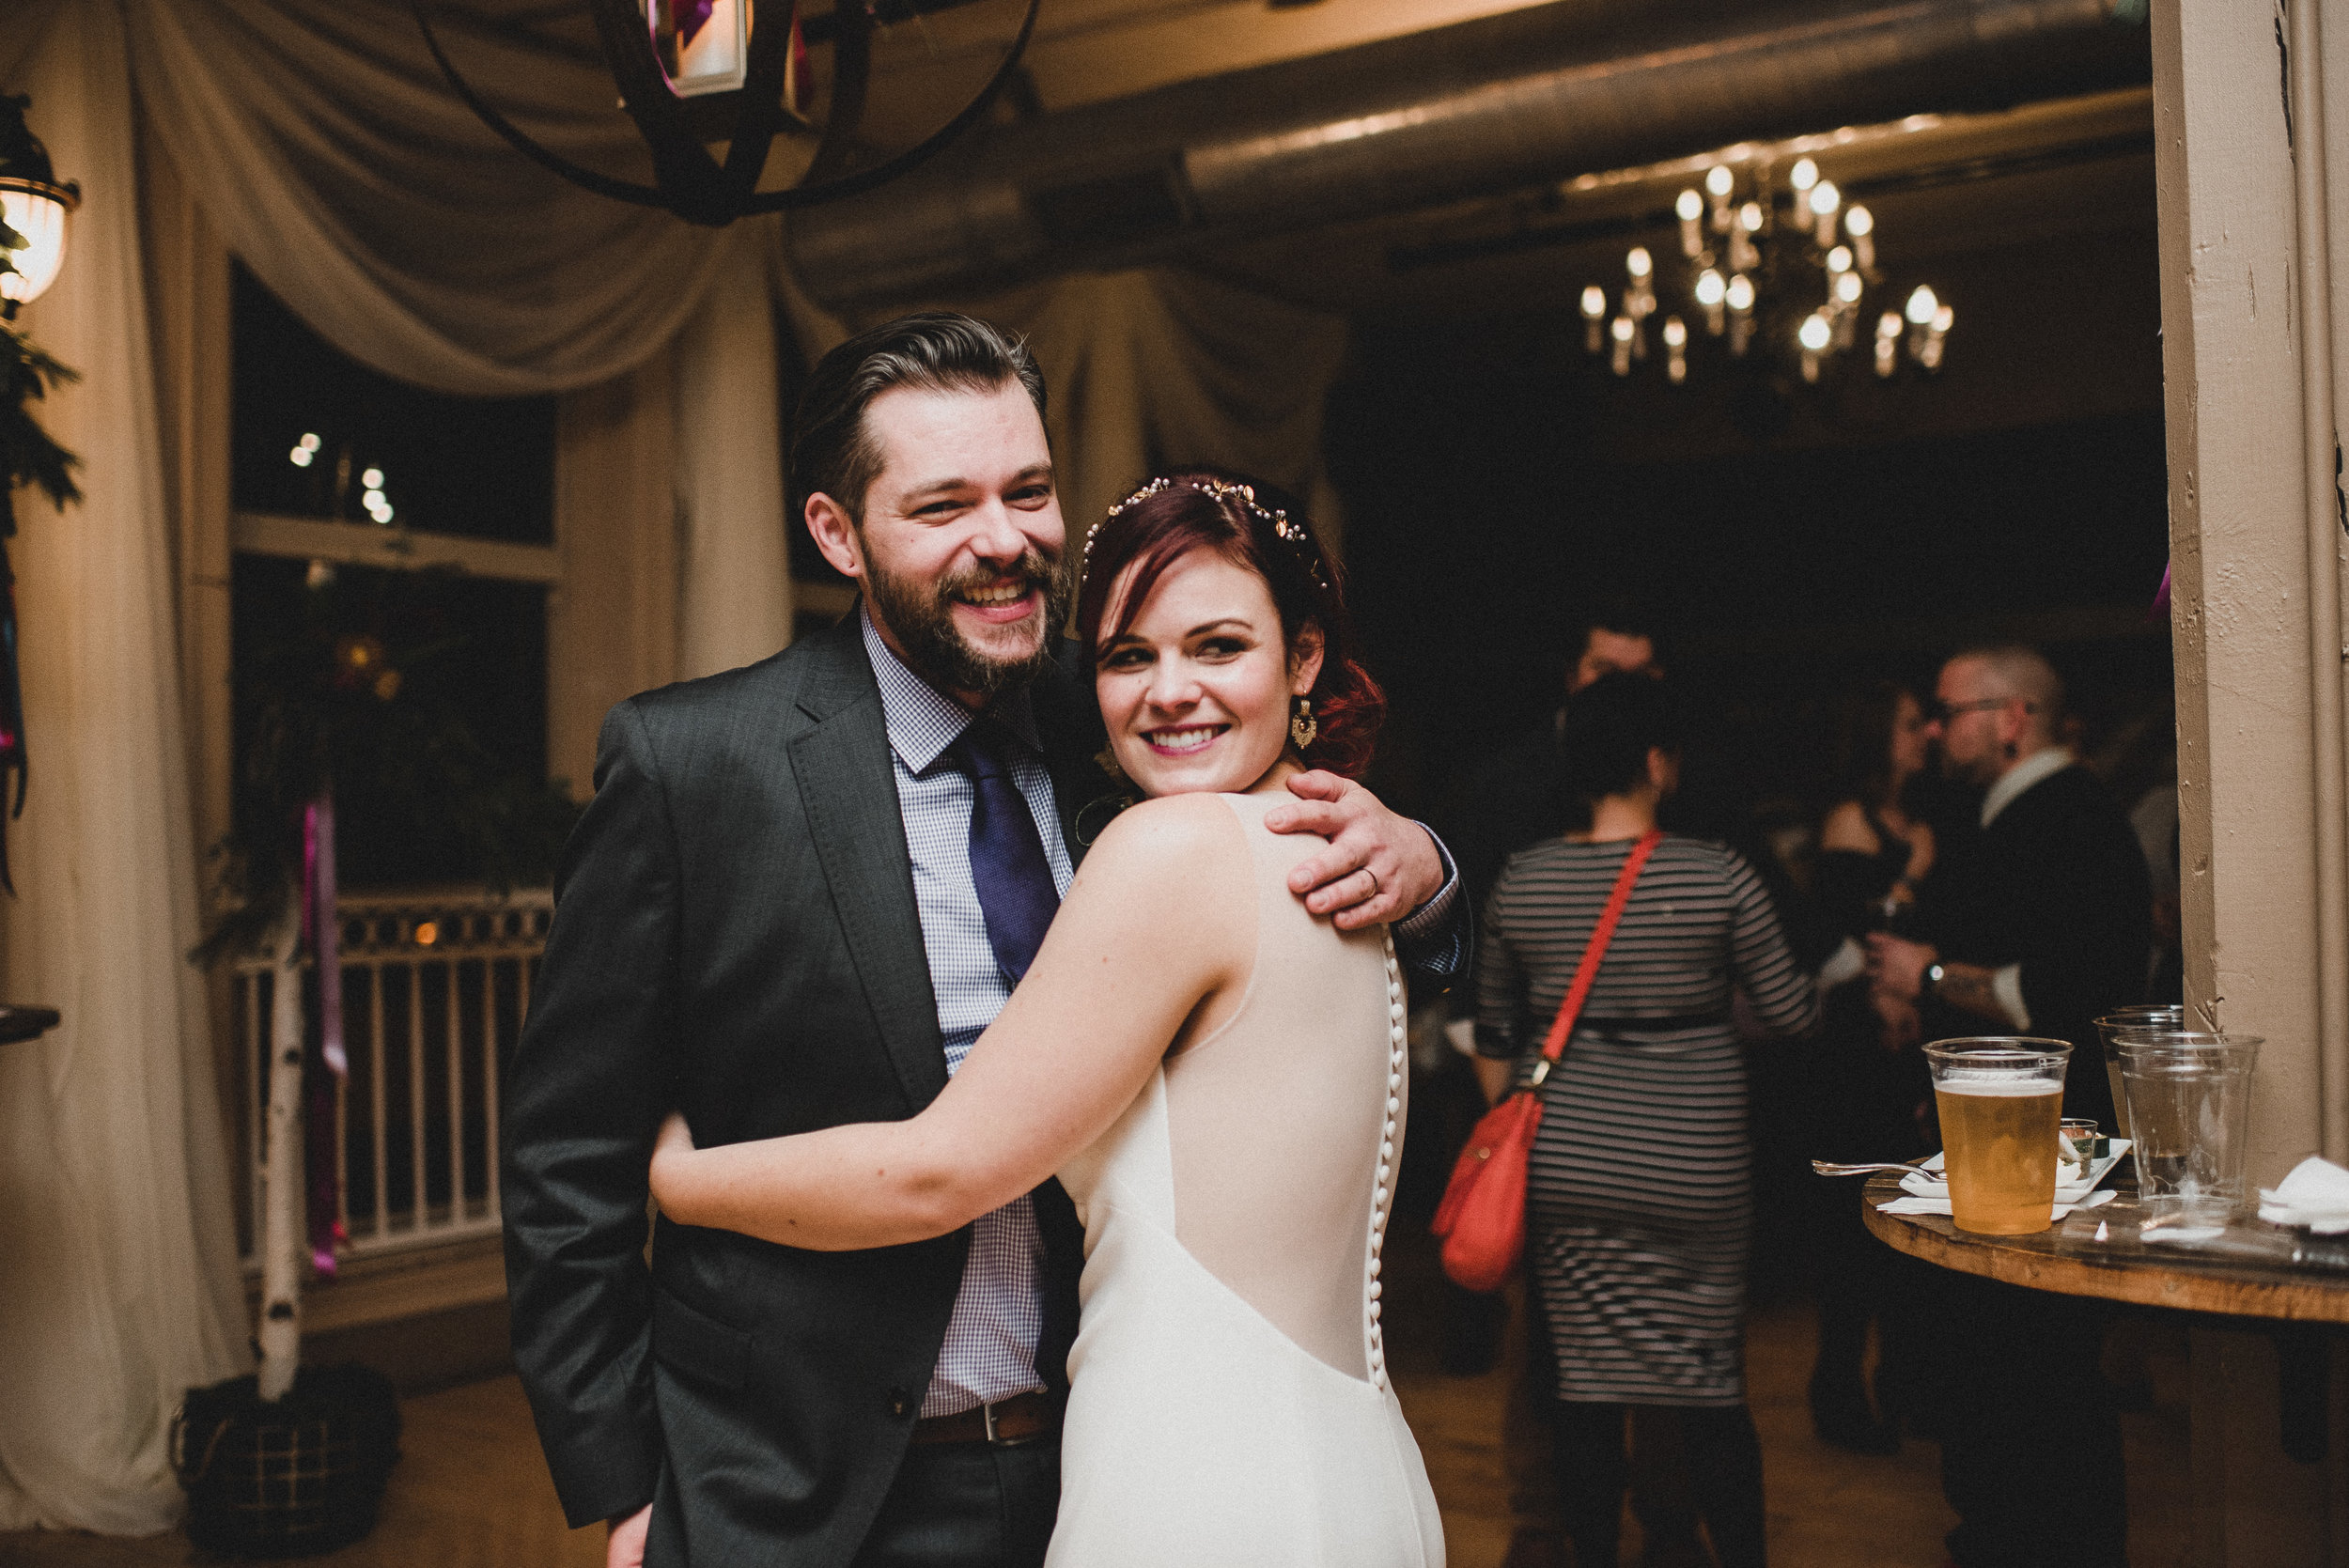 Newlyweds at Reception